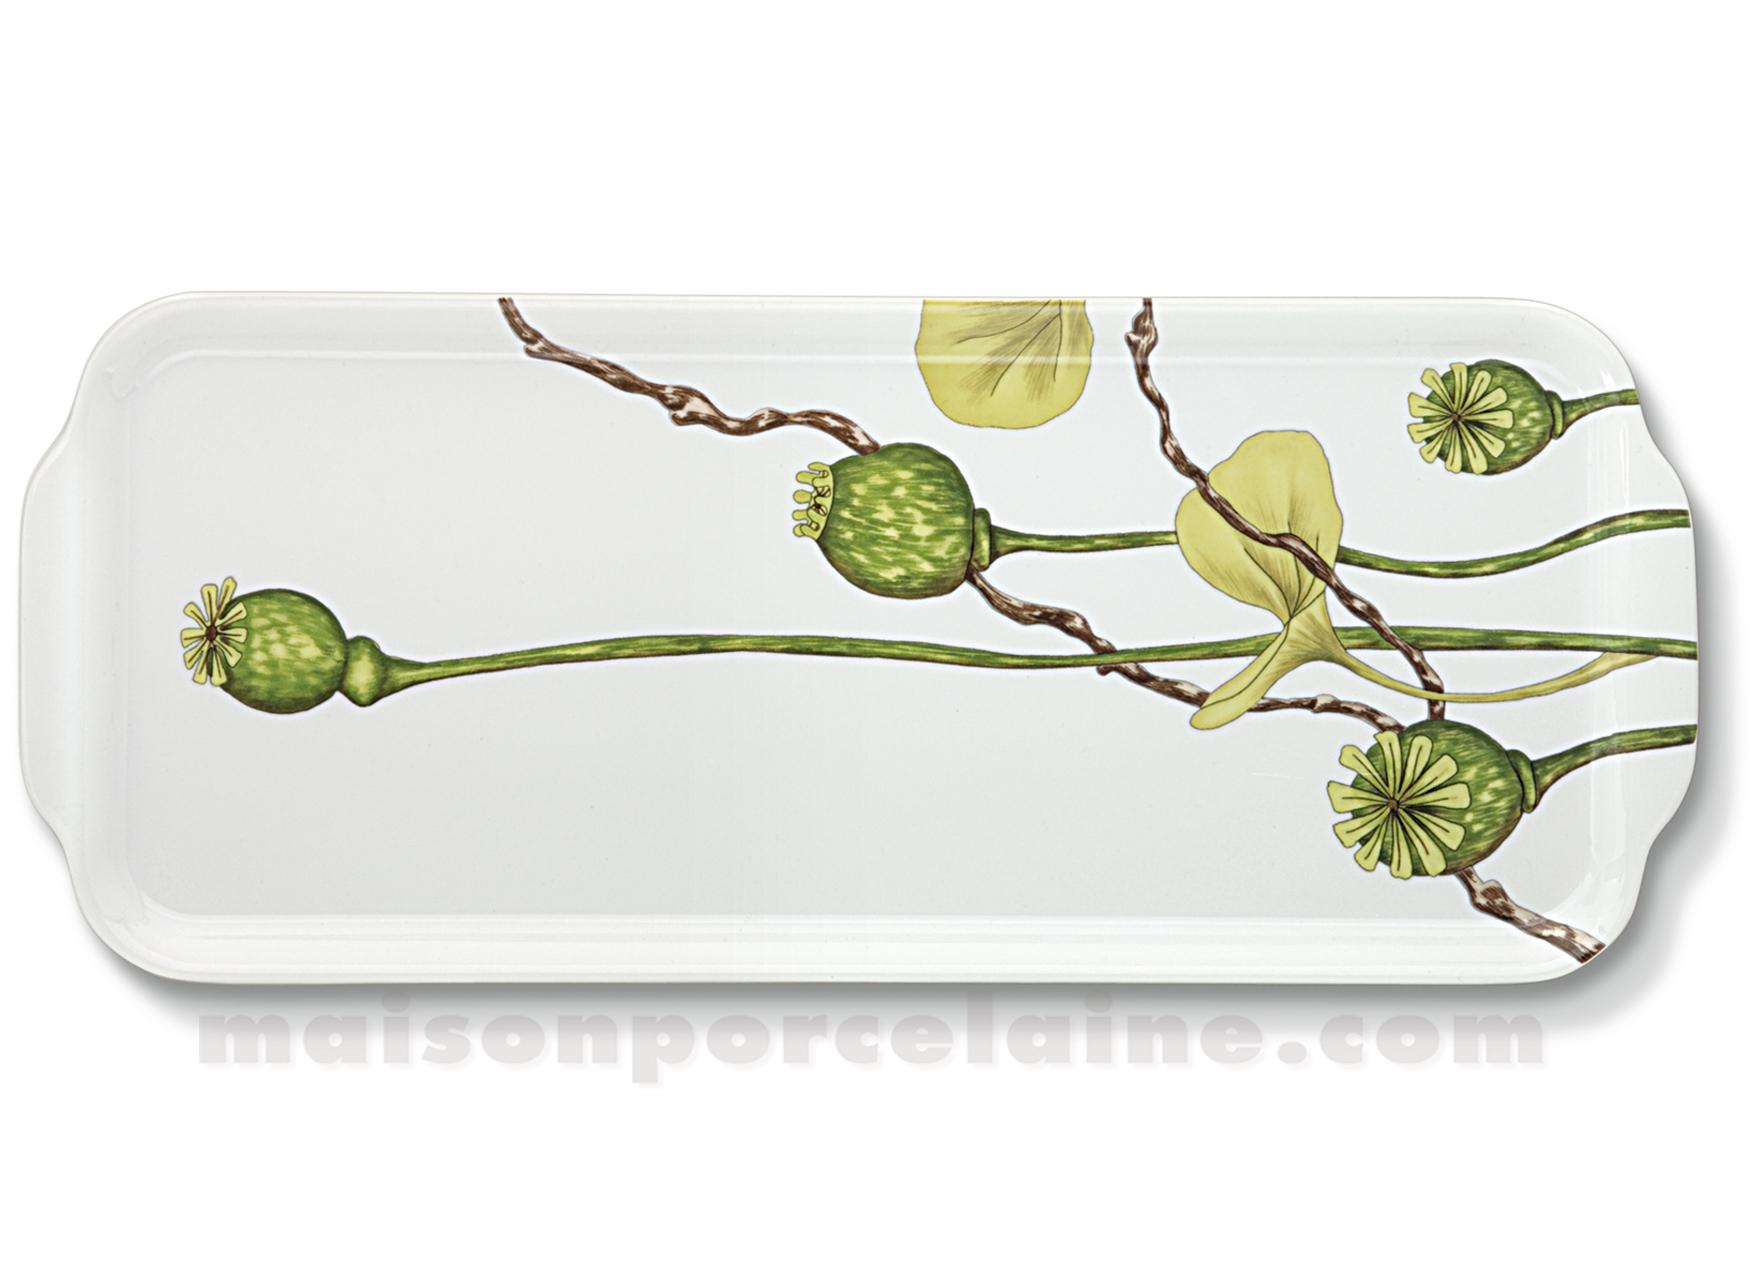 pin assiette plate cake on pinterest. Black Bedroom Furniture Sets. Home Design Ideas